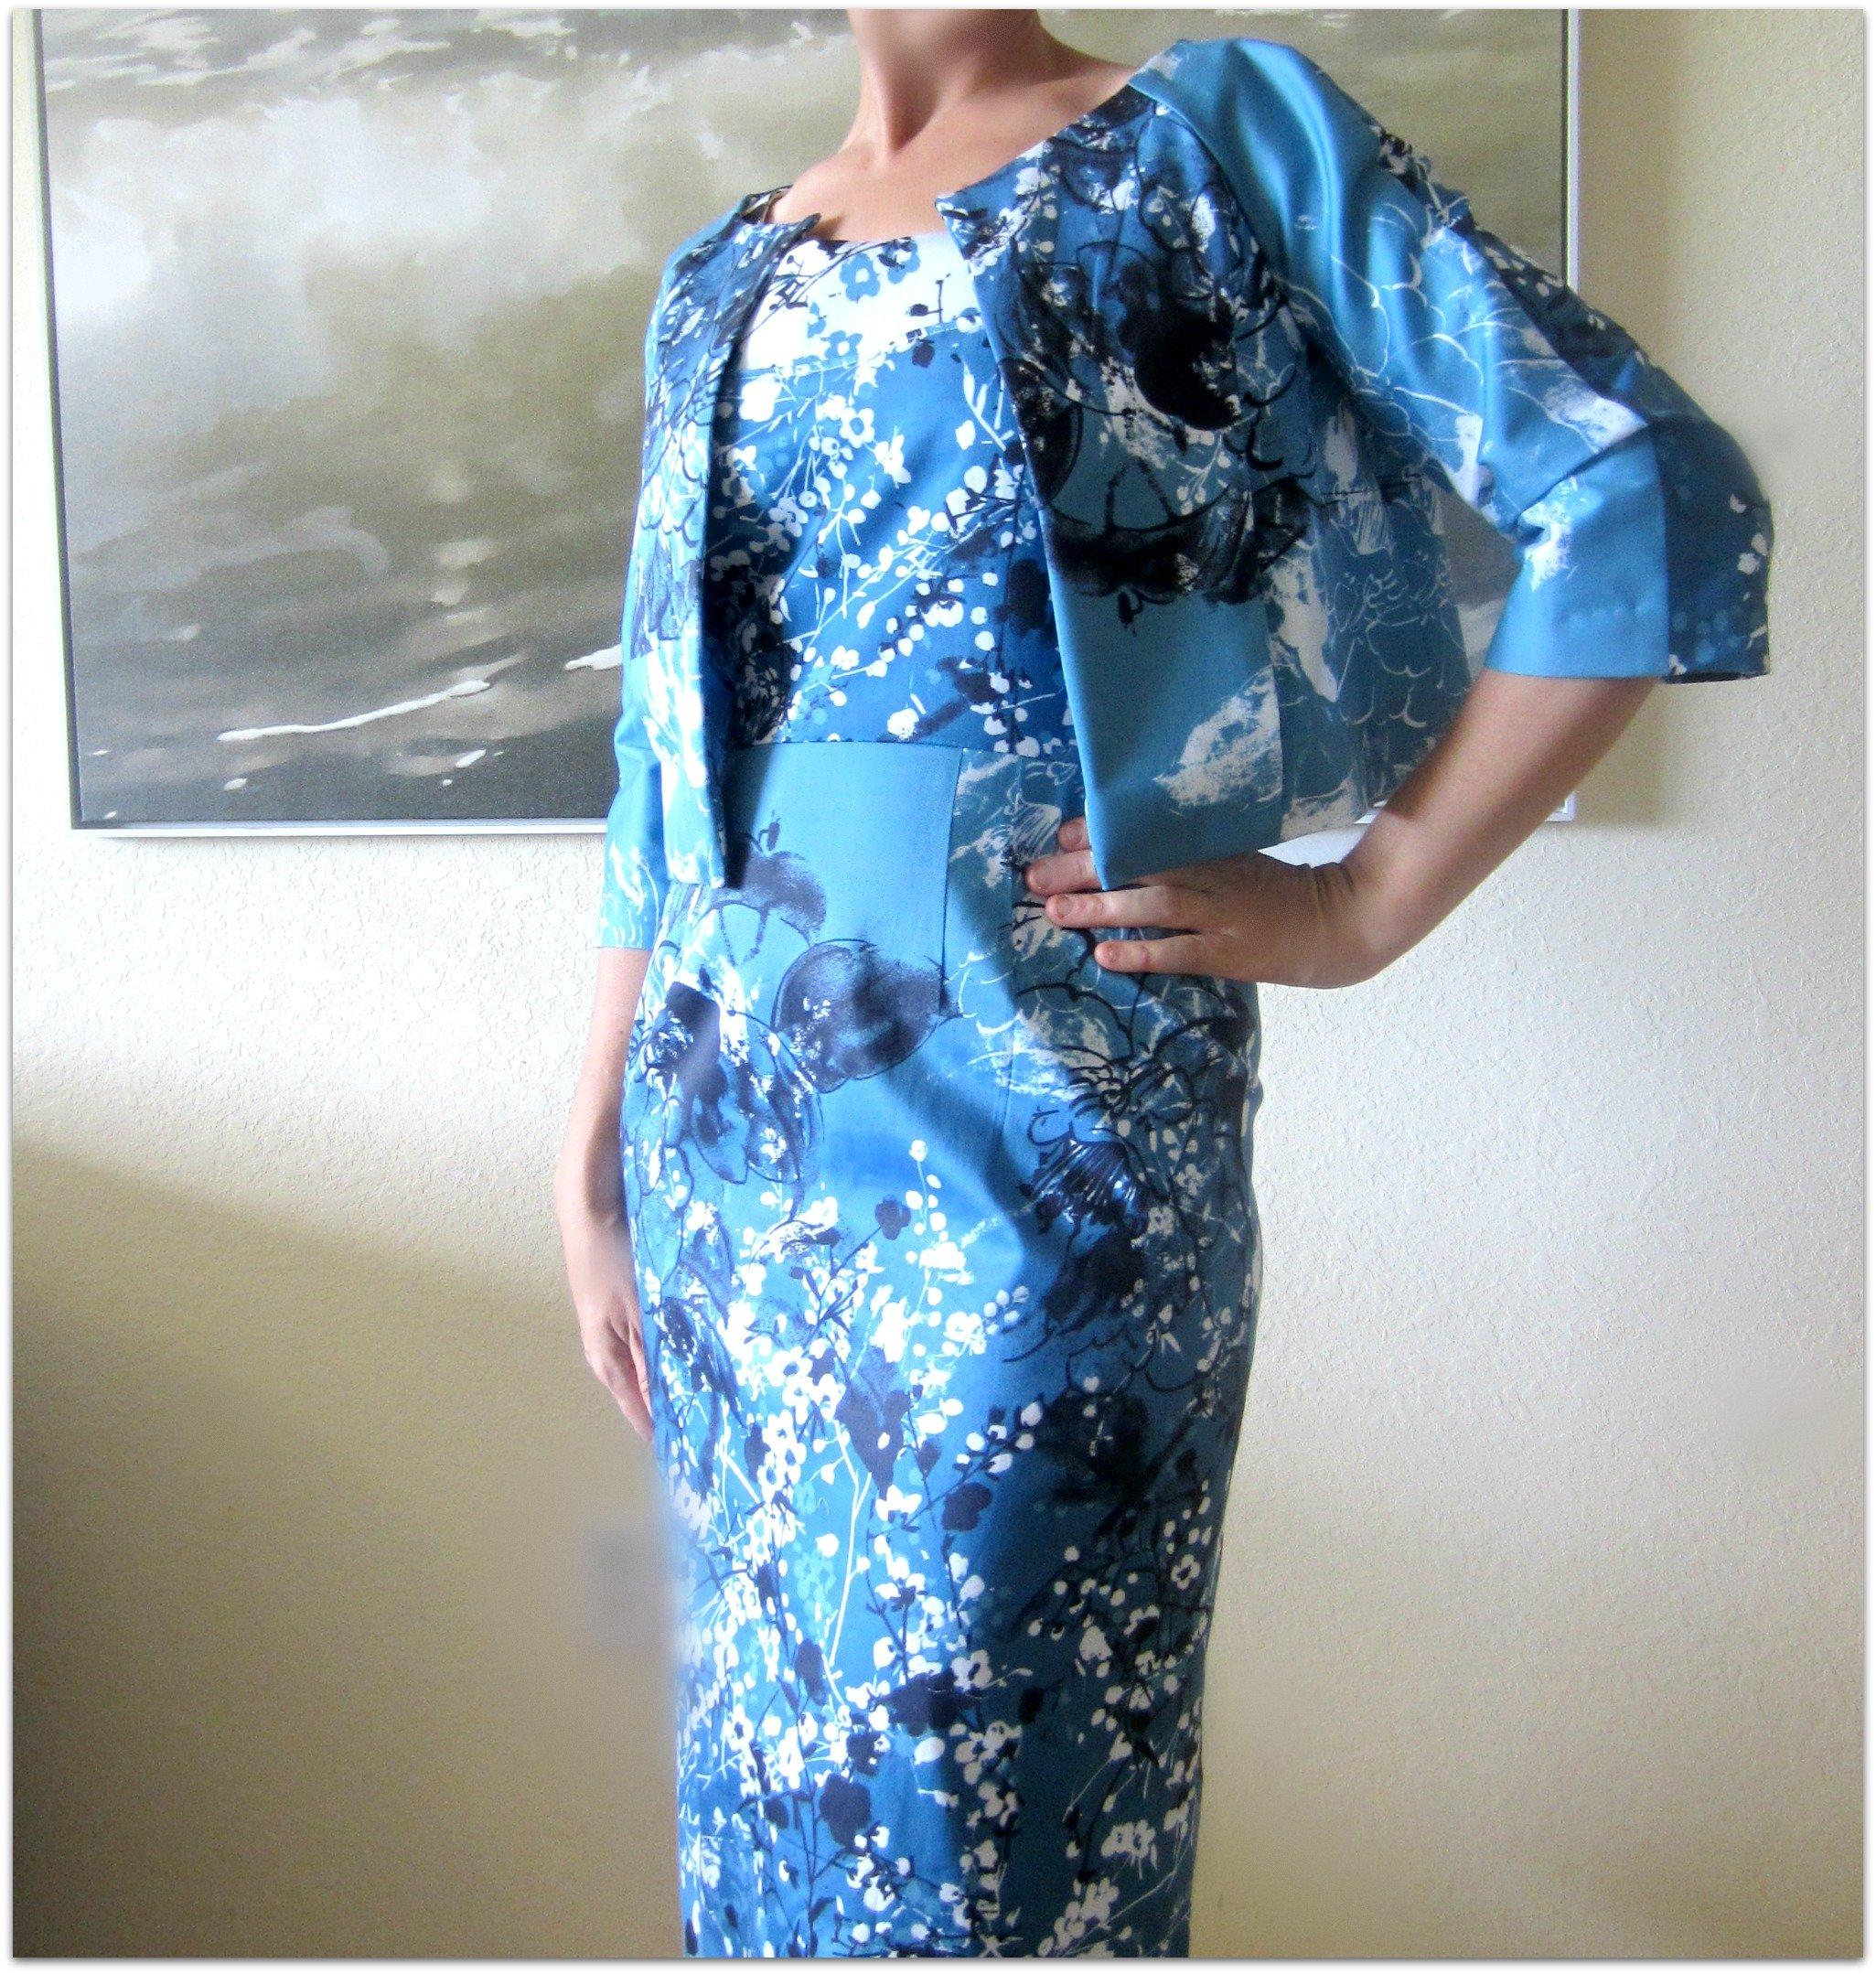 Vintage Vogue Blooming Dress